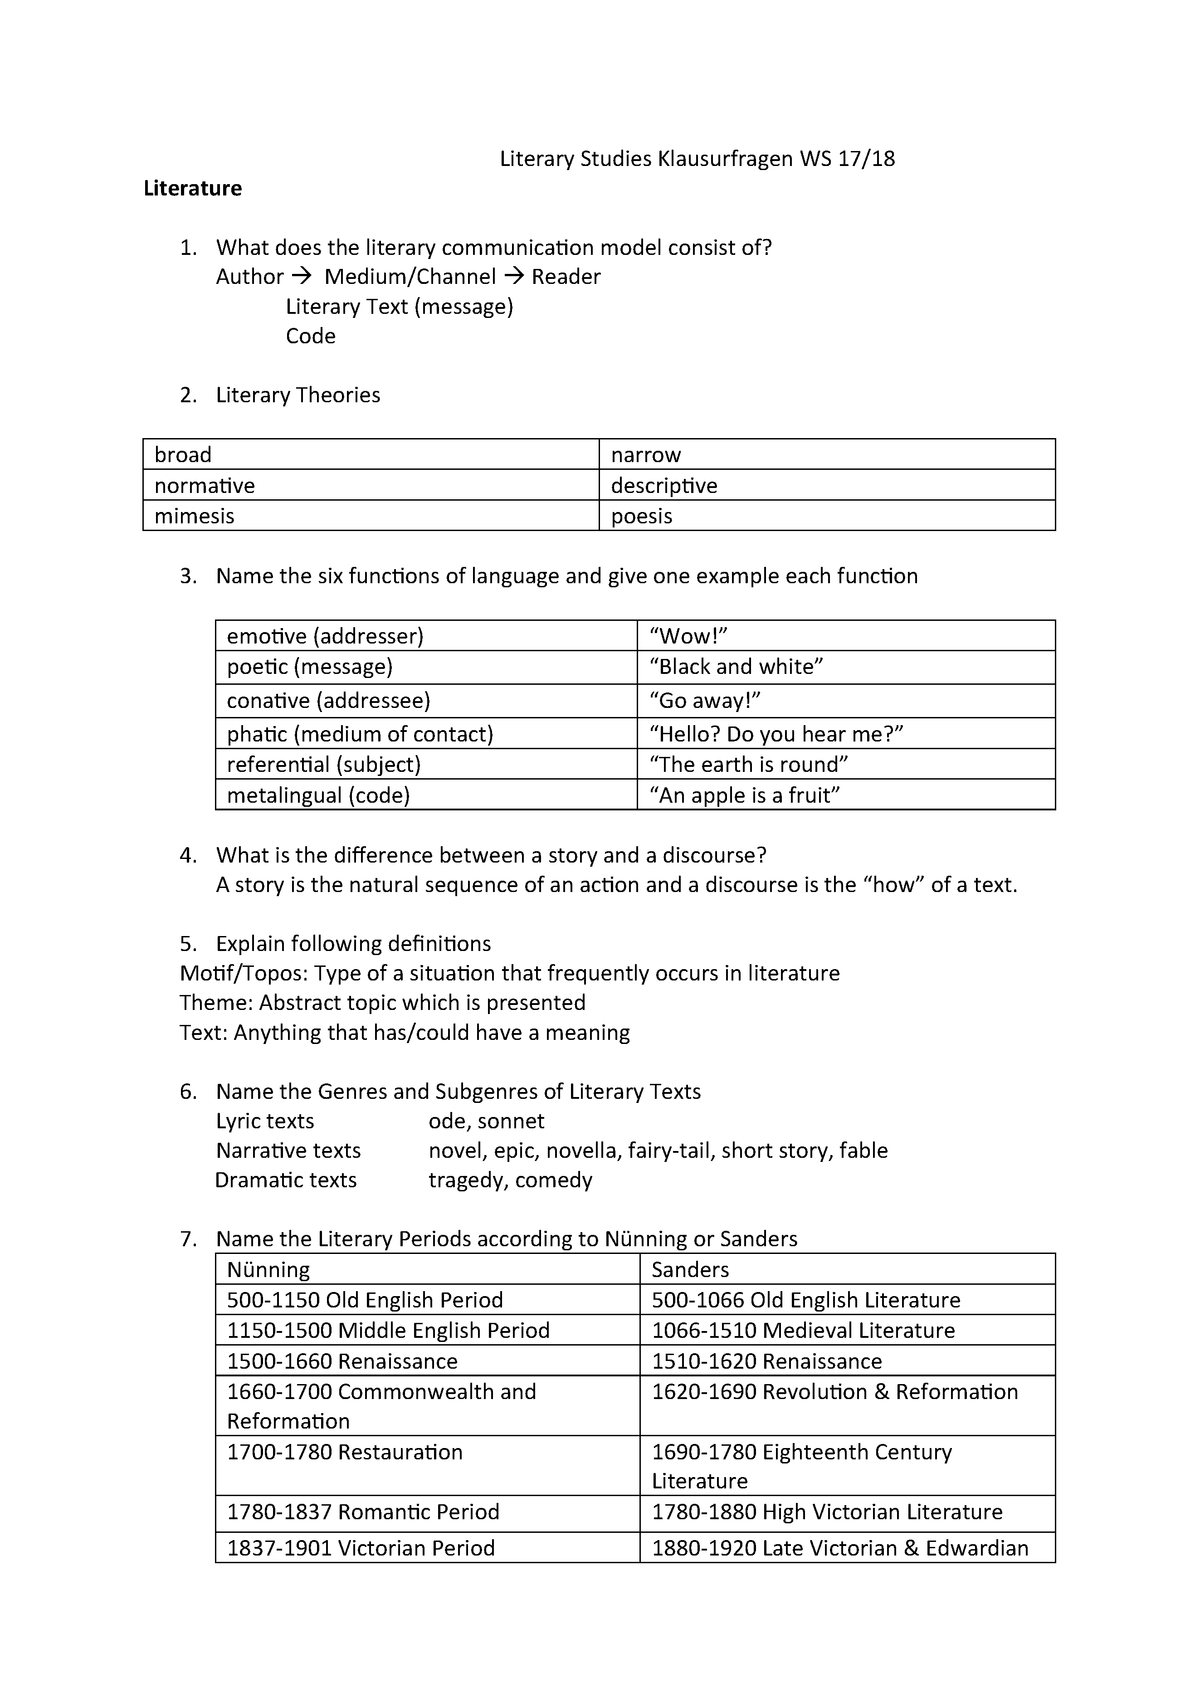 Literary Studies Fragenkatalog beschriftet - L 008 32710